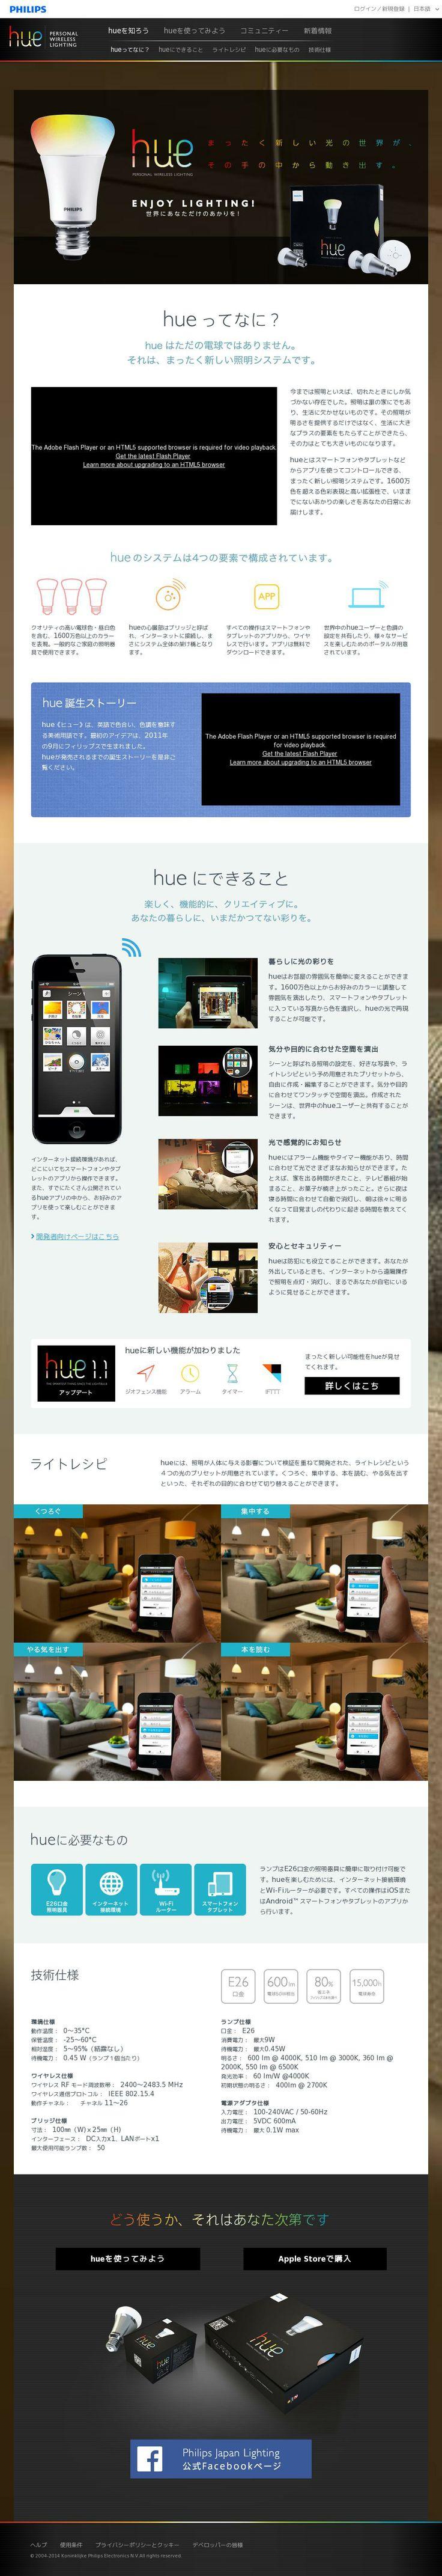 The website 'http://www.meethue.com/ja-JP' courtesy of @Pinstamatic (http://pinstamatic.com)